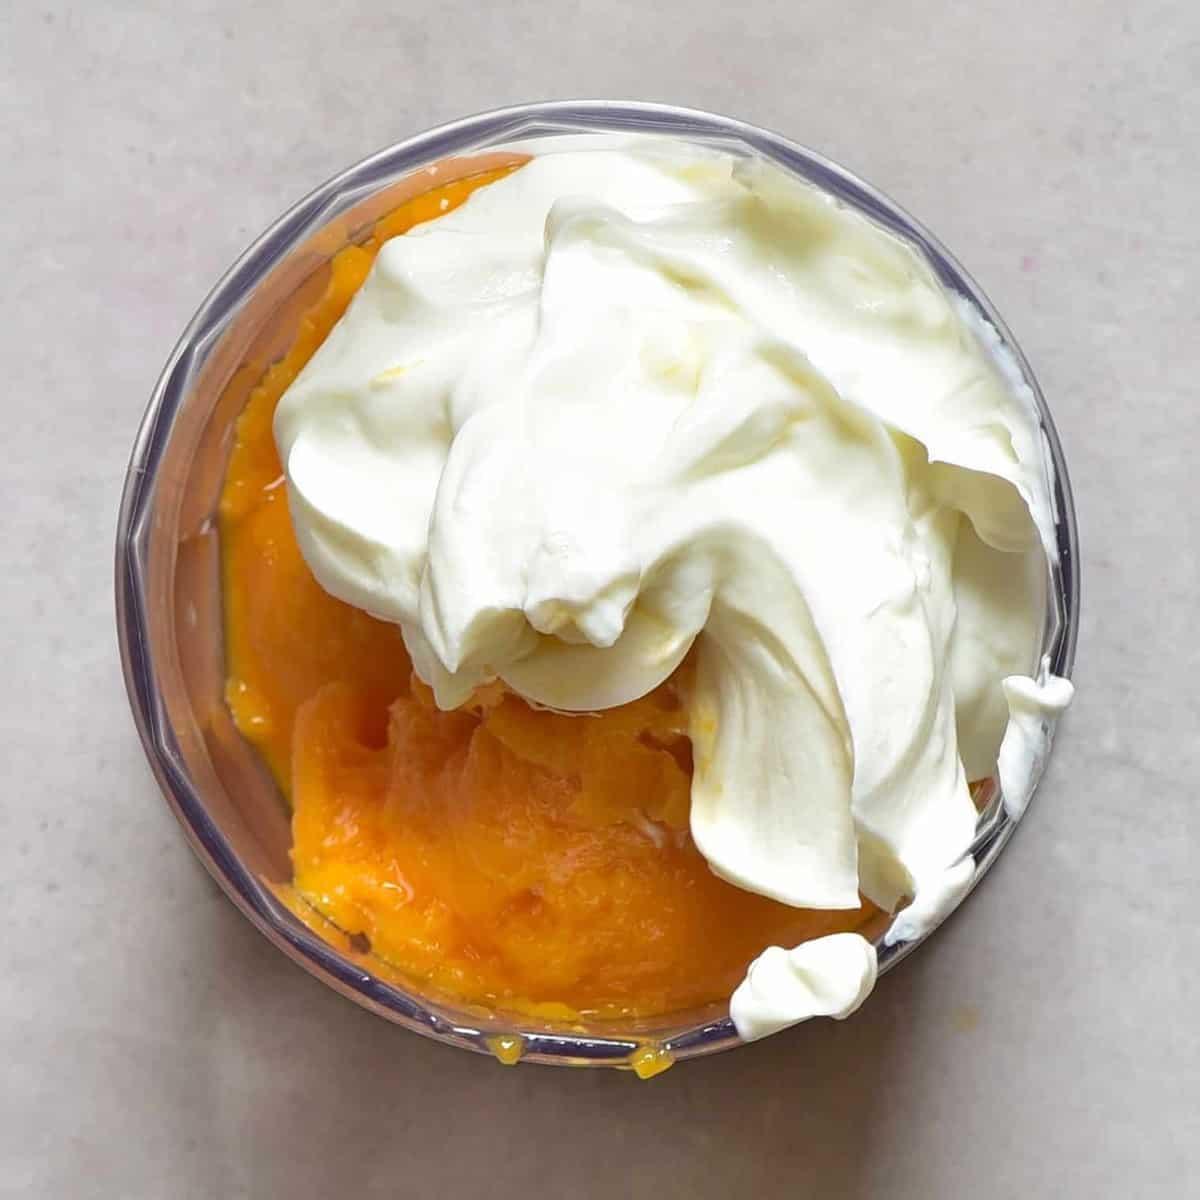 Yogurt and Mango ready to mix for a yummy breakfast